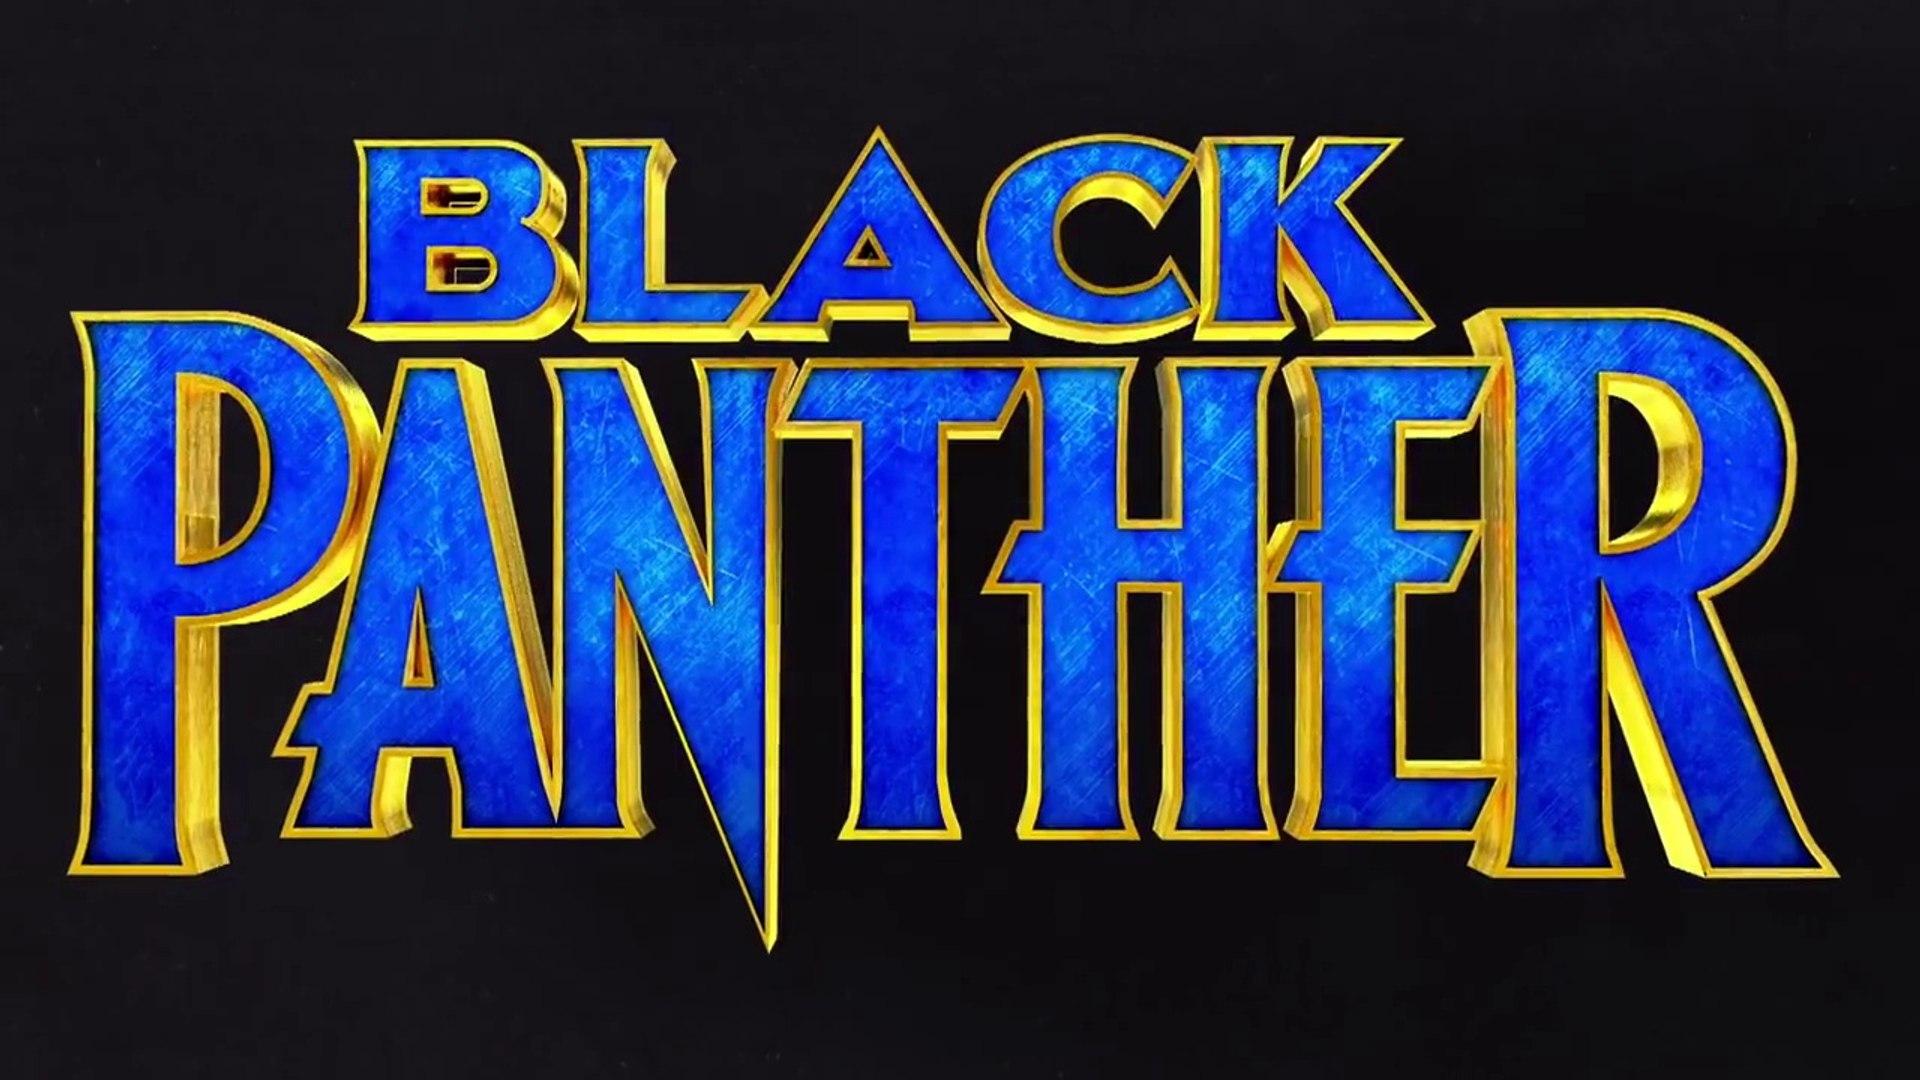 SNL Parodies Black Panther on Saturday Night Live